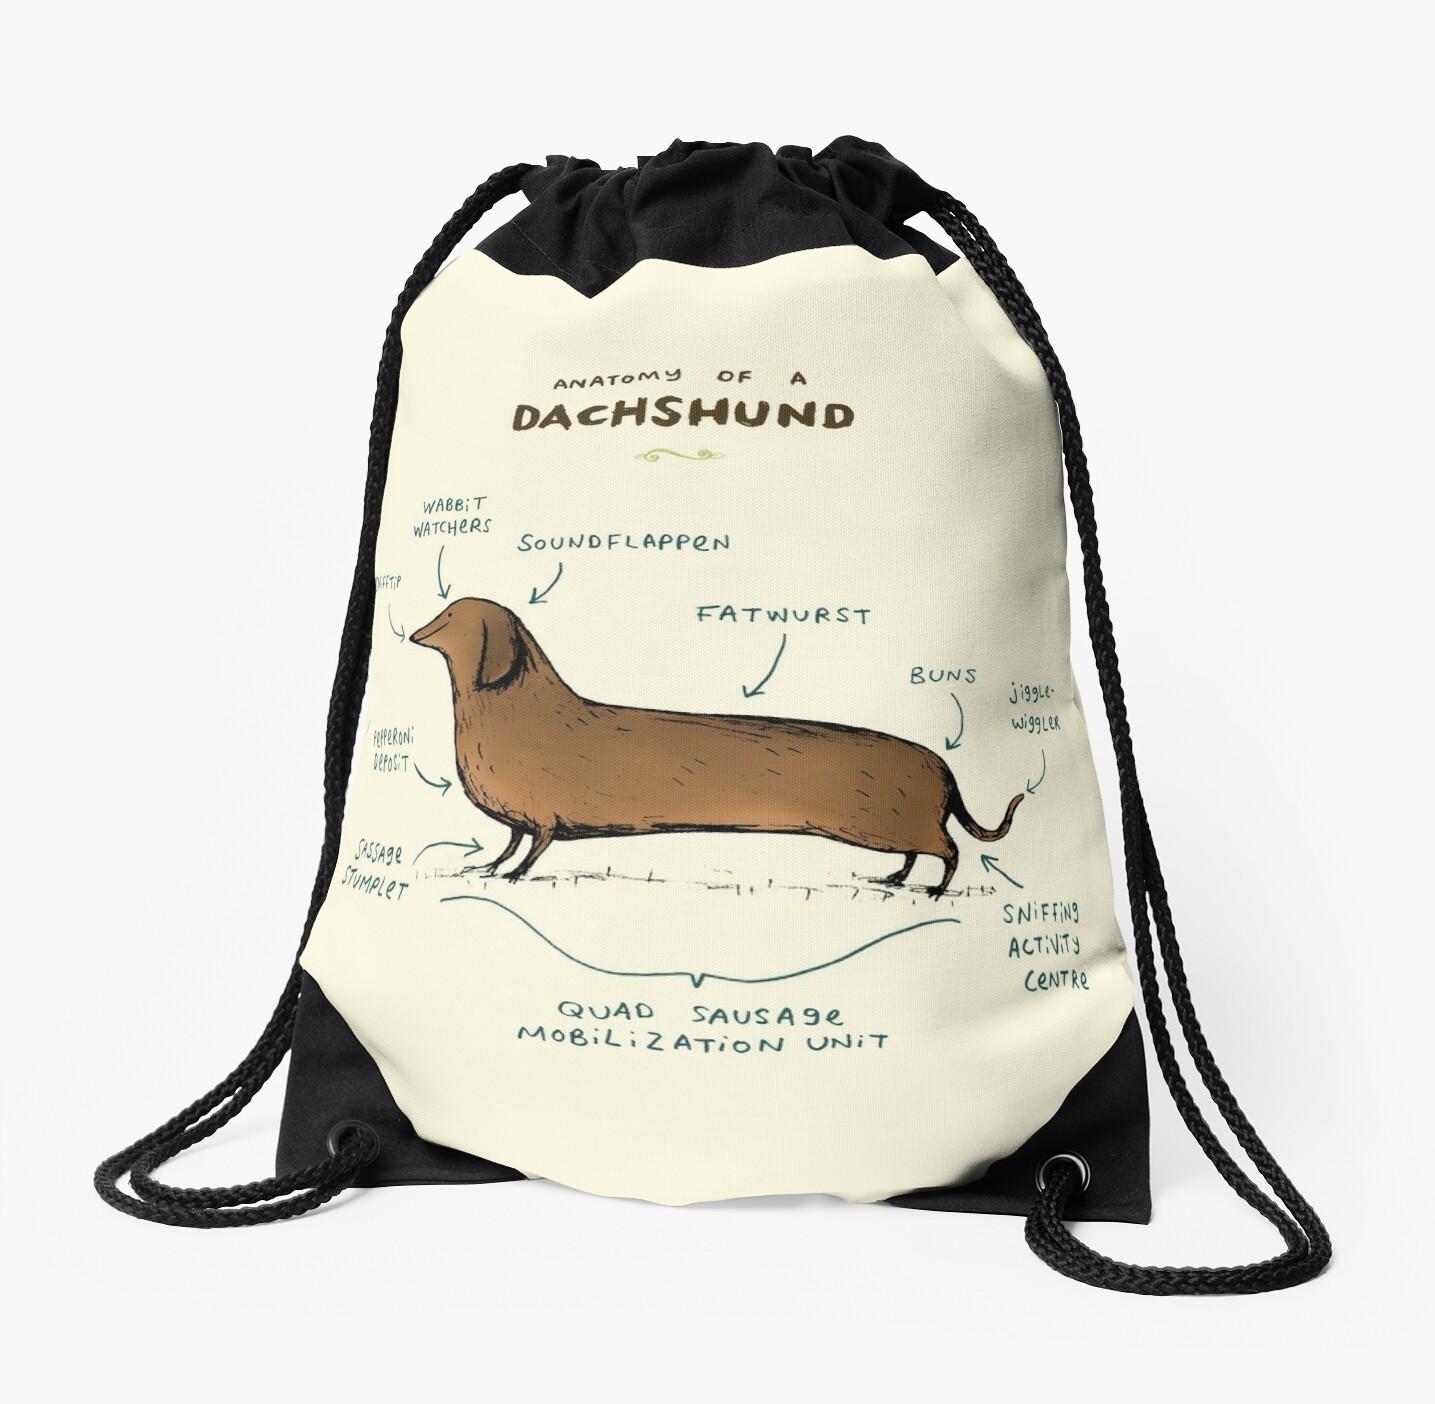 Anatomy of a Dachshund by Sophie Corrigan